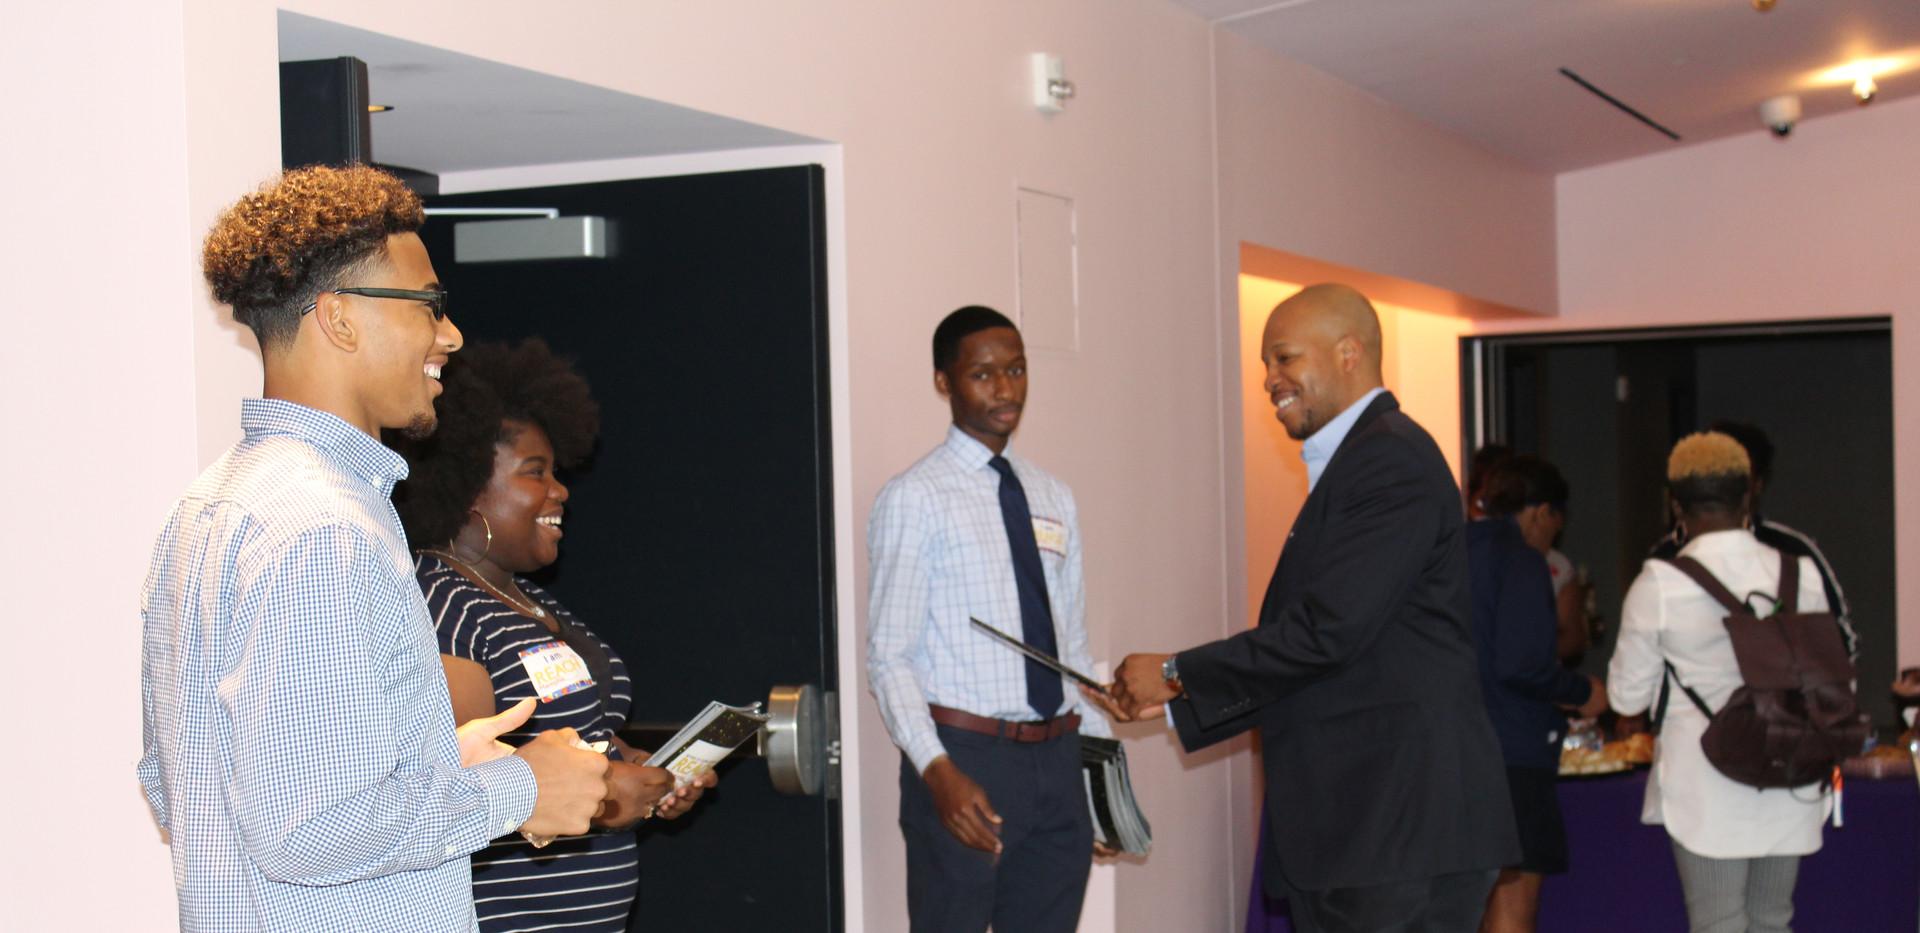 REACH Memphis Student Executive Board helping mentor inside